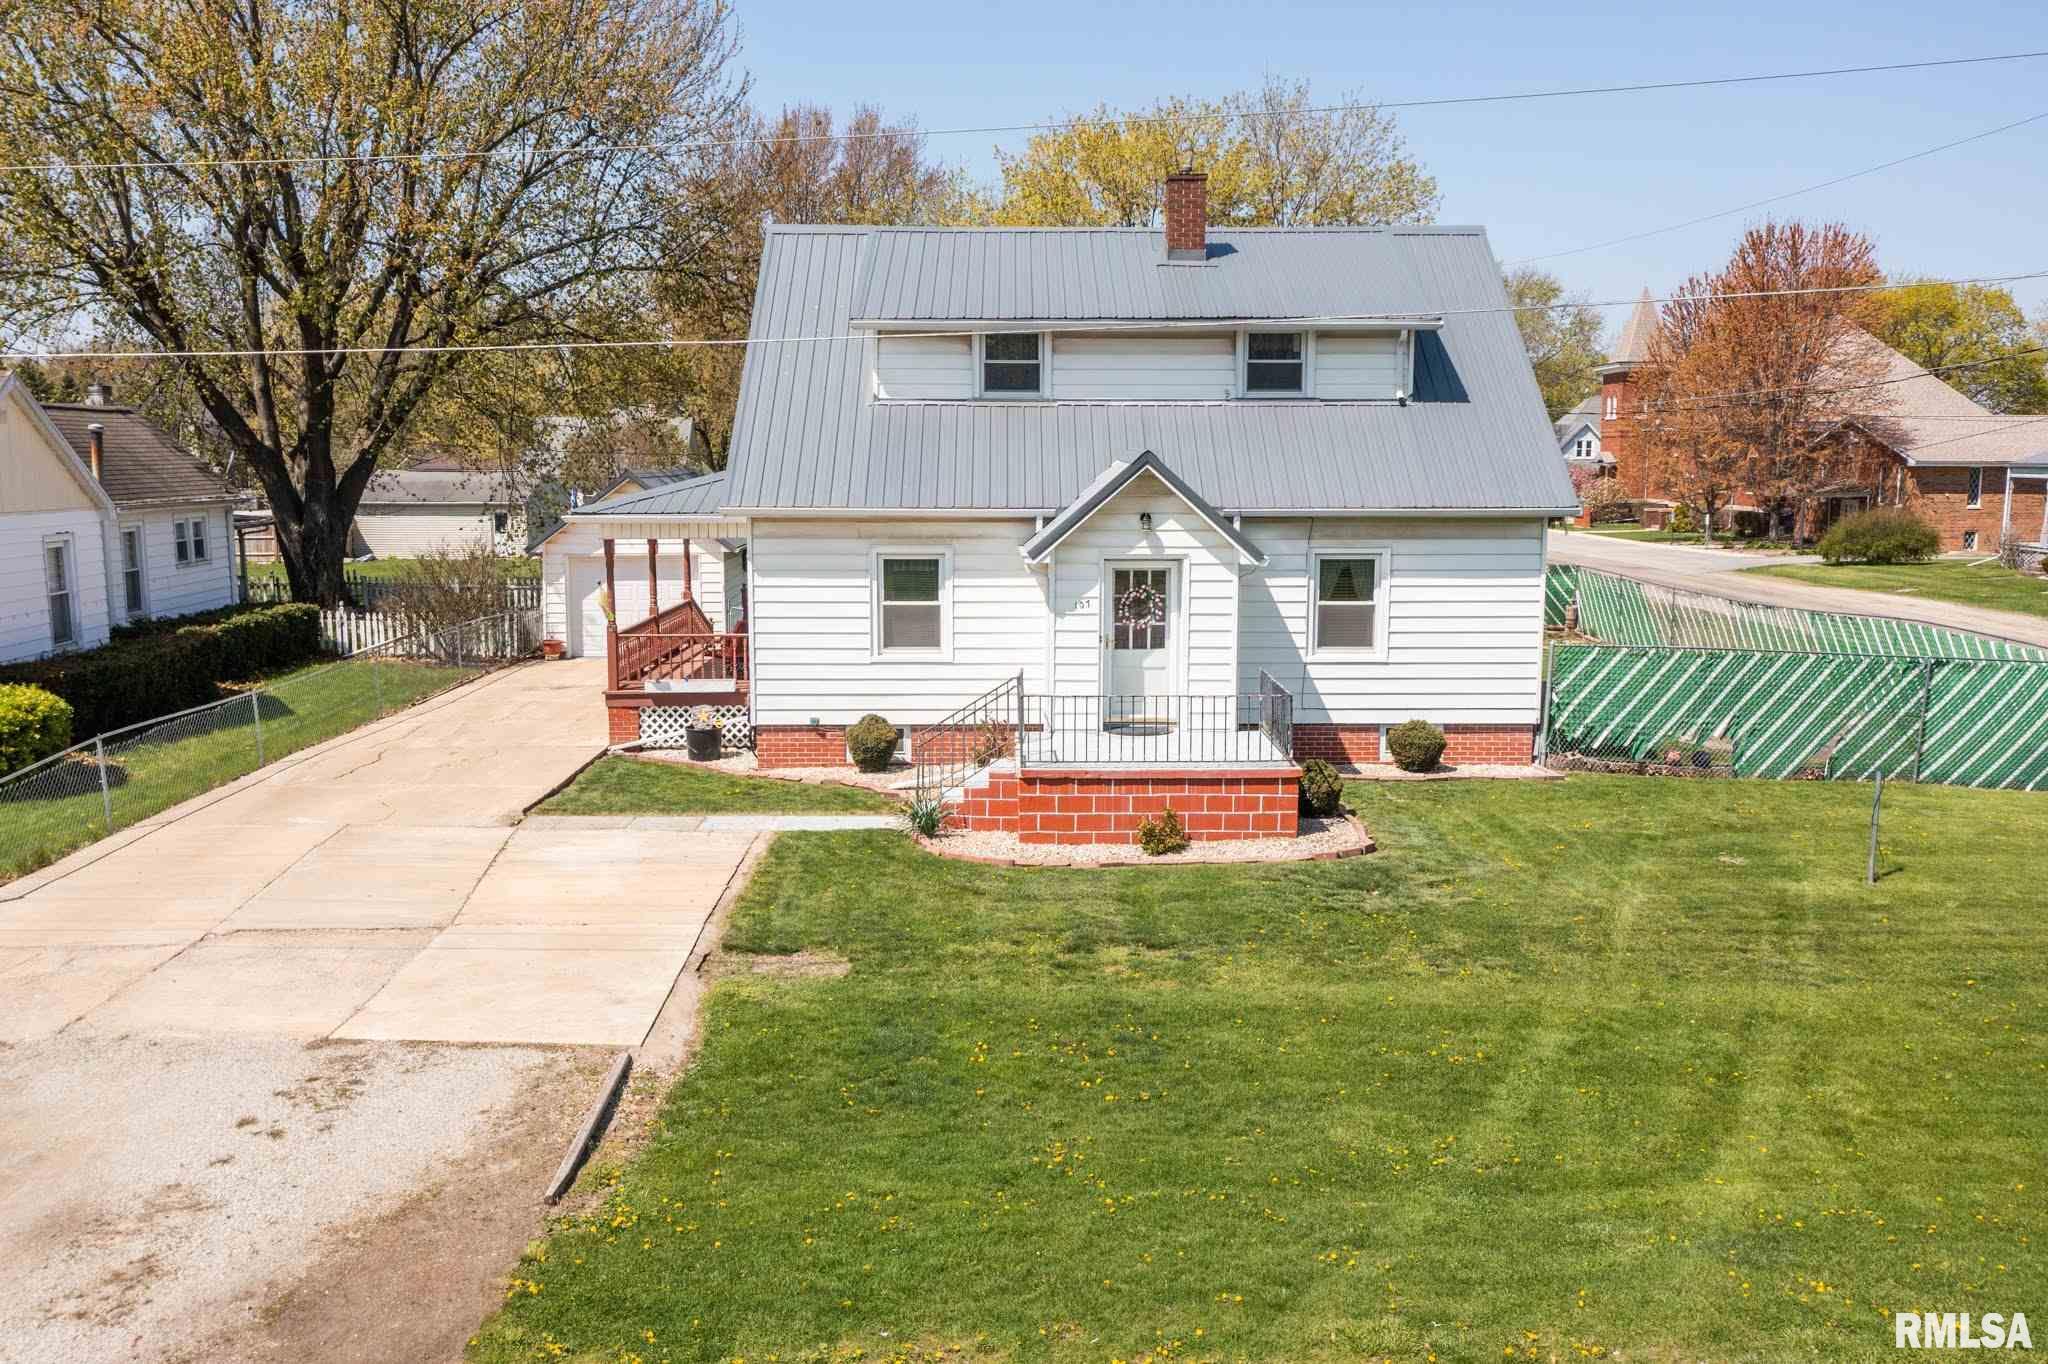 107 N UNION Property Photo - Yates City, IL real estate listing